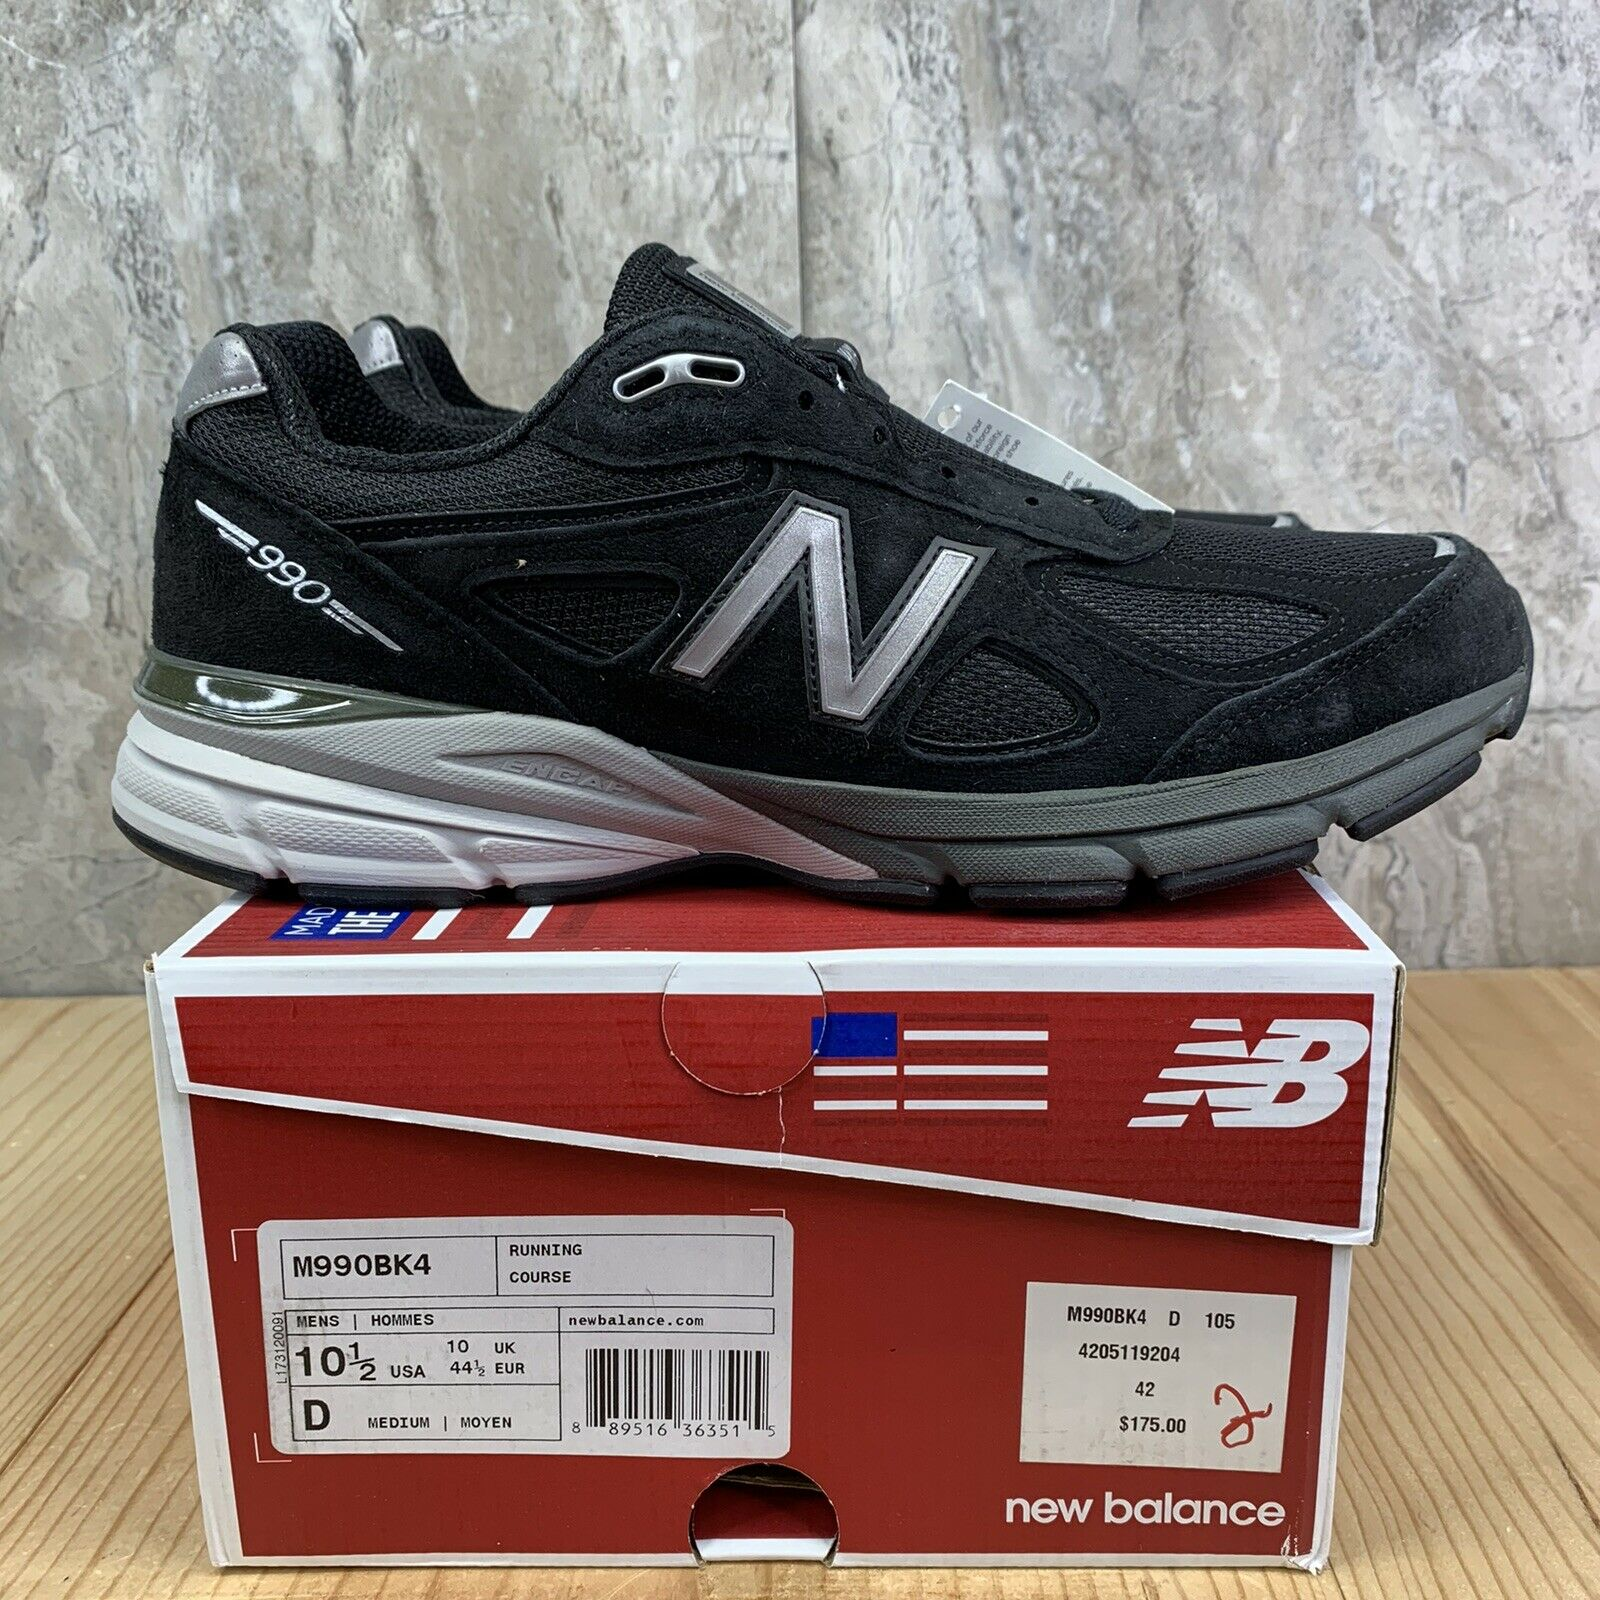 New Balance M990BK4 V4 Size 10.5 Mens